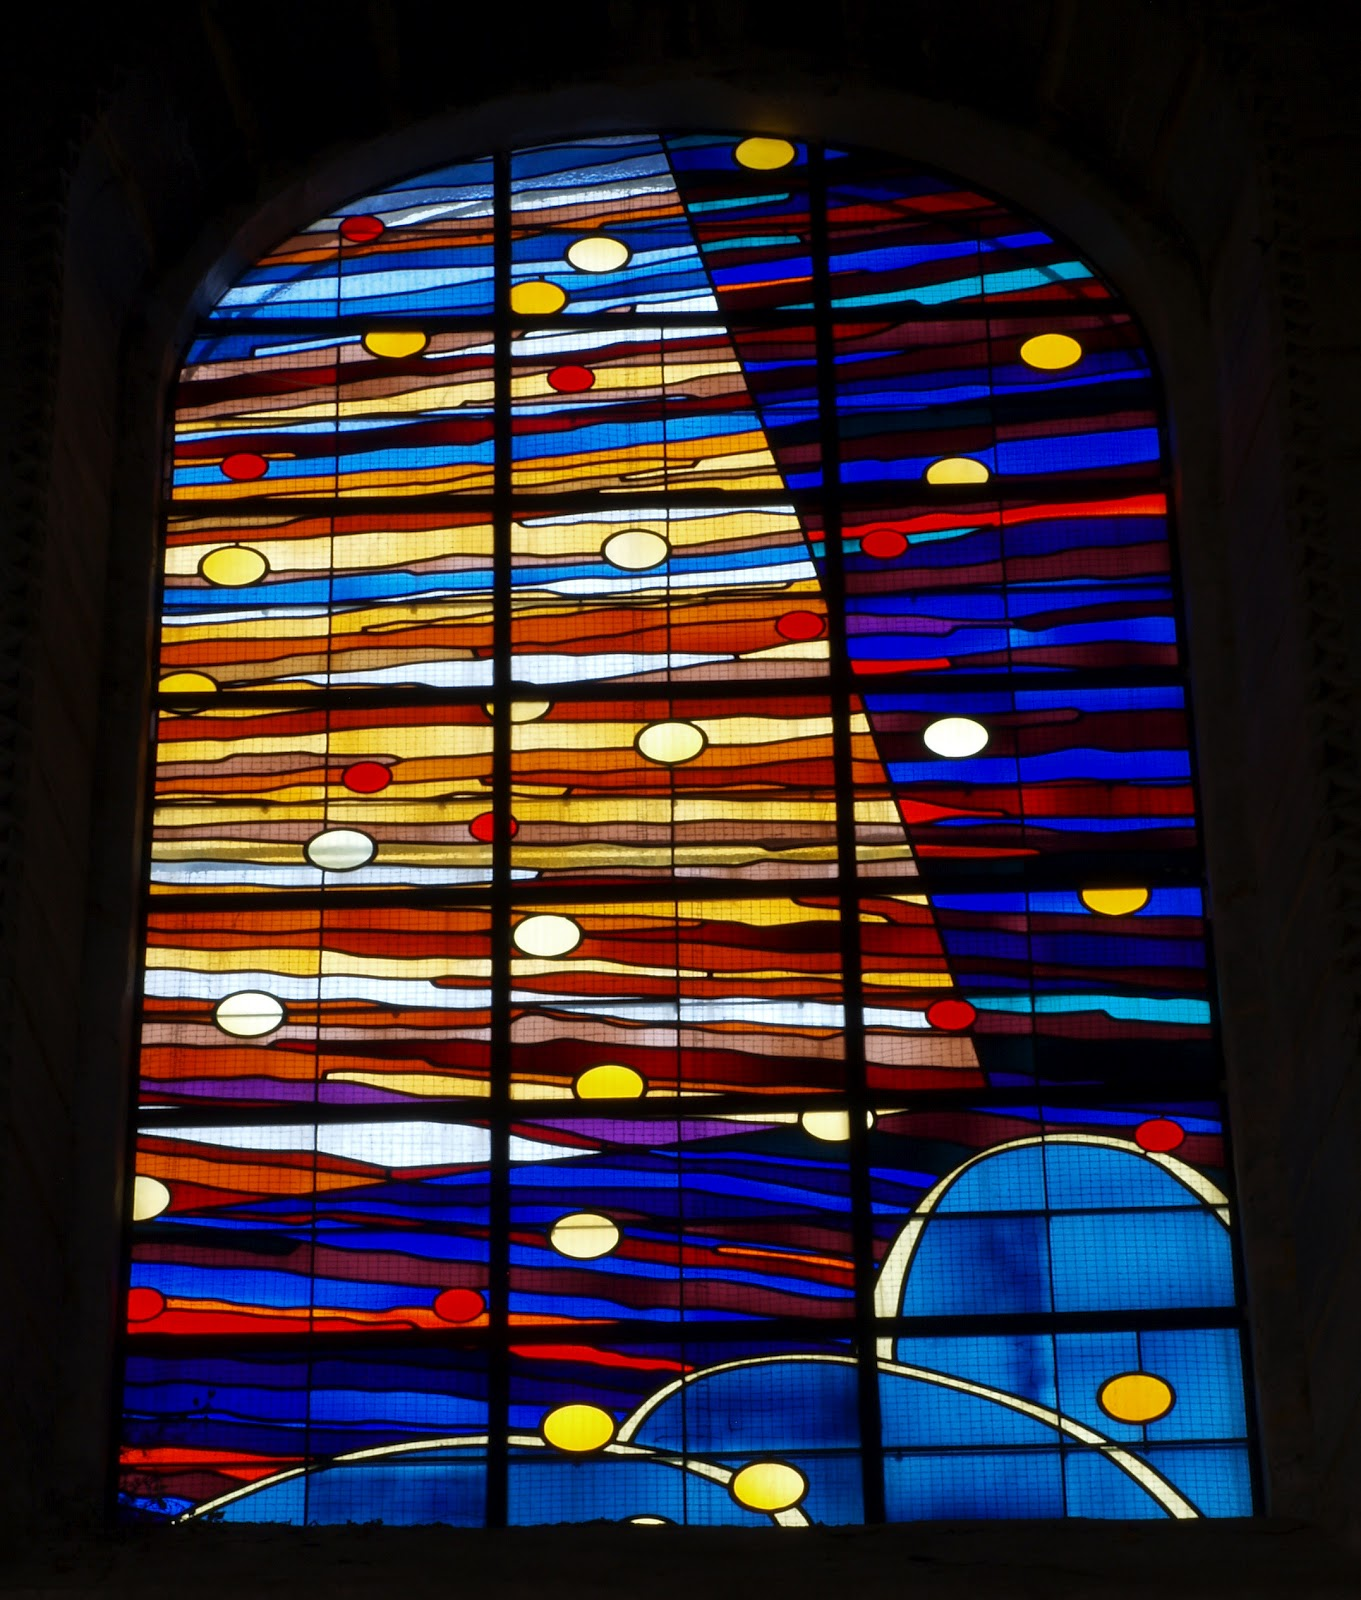 Vidrieras arte y arquitectura vidrieras de arte - Vidrieras modernas ...